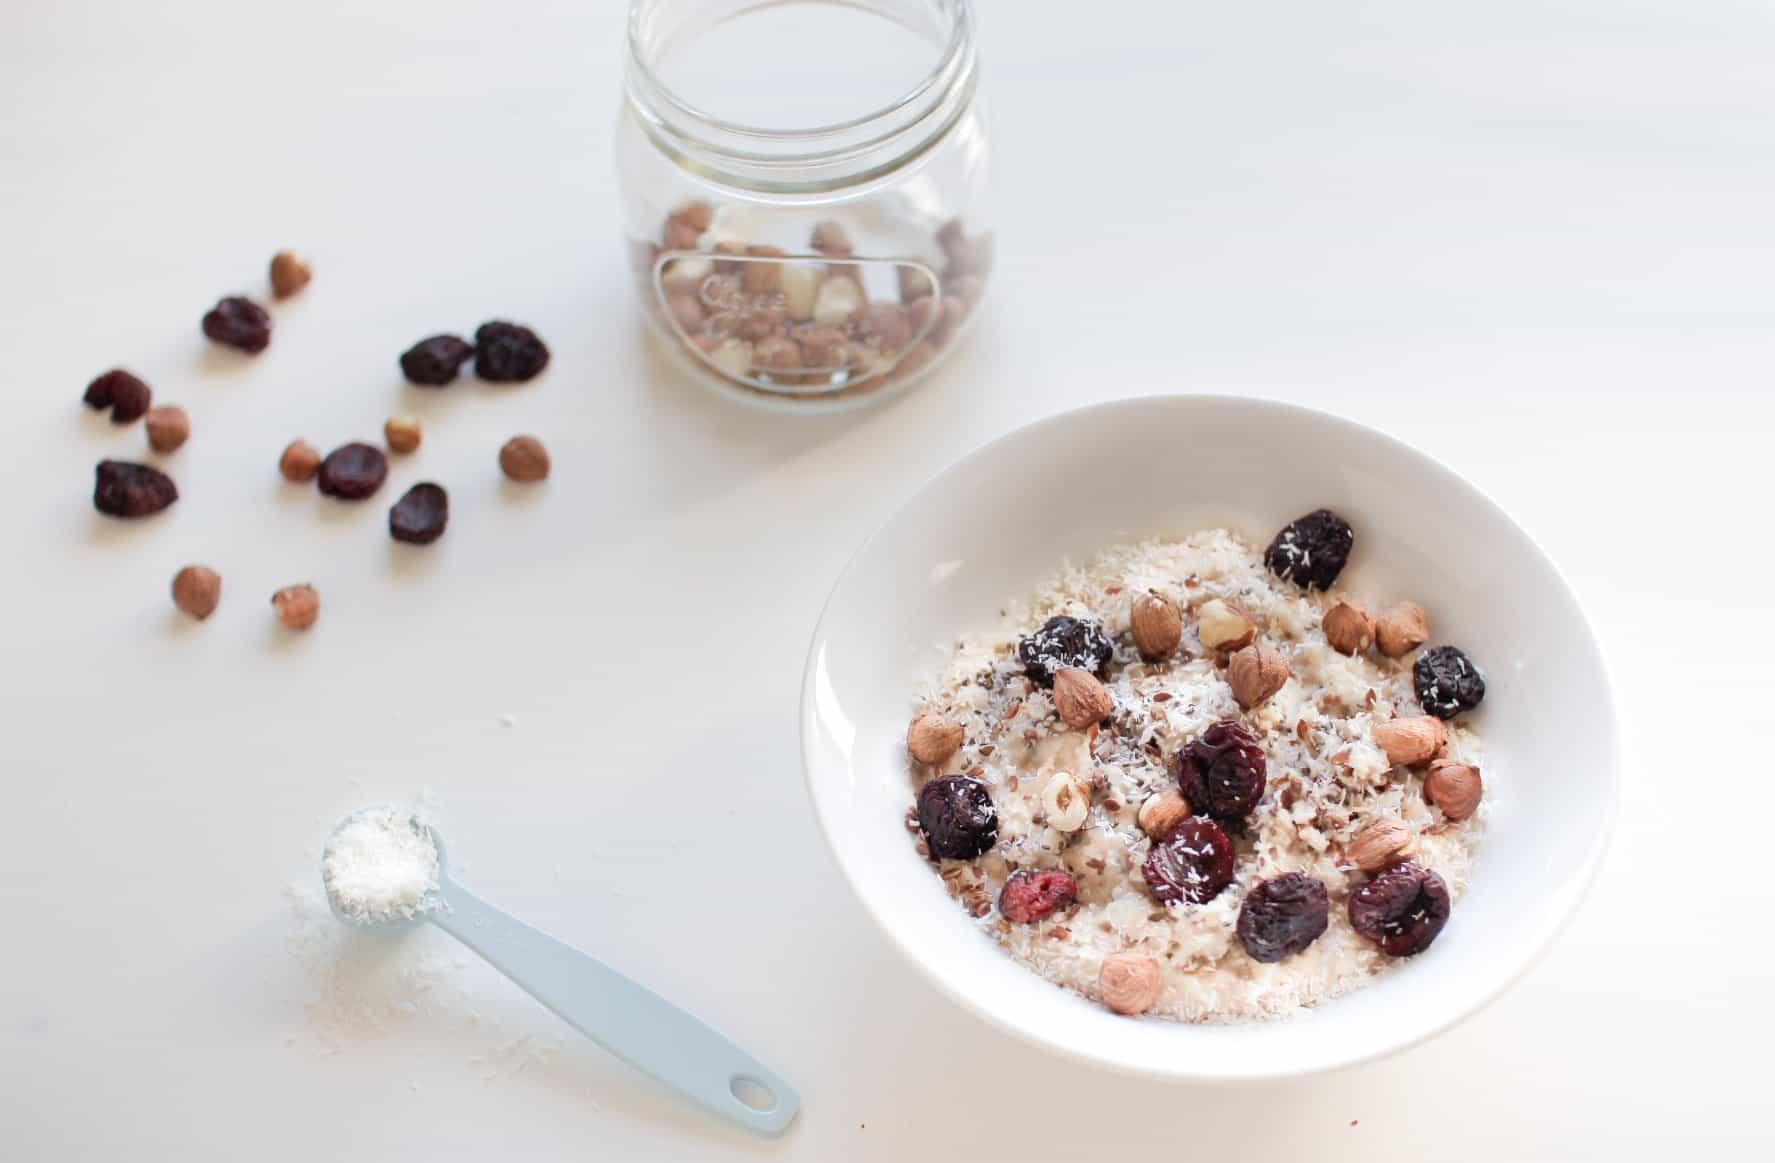 Cherry and Hazelnut Seedy Porridge